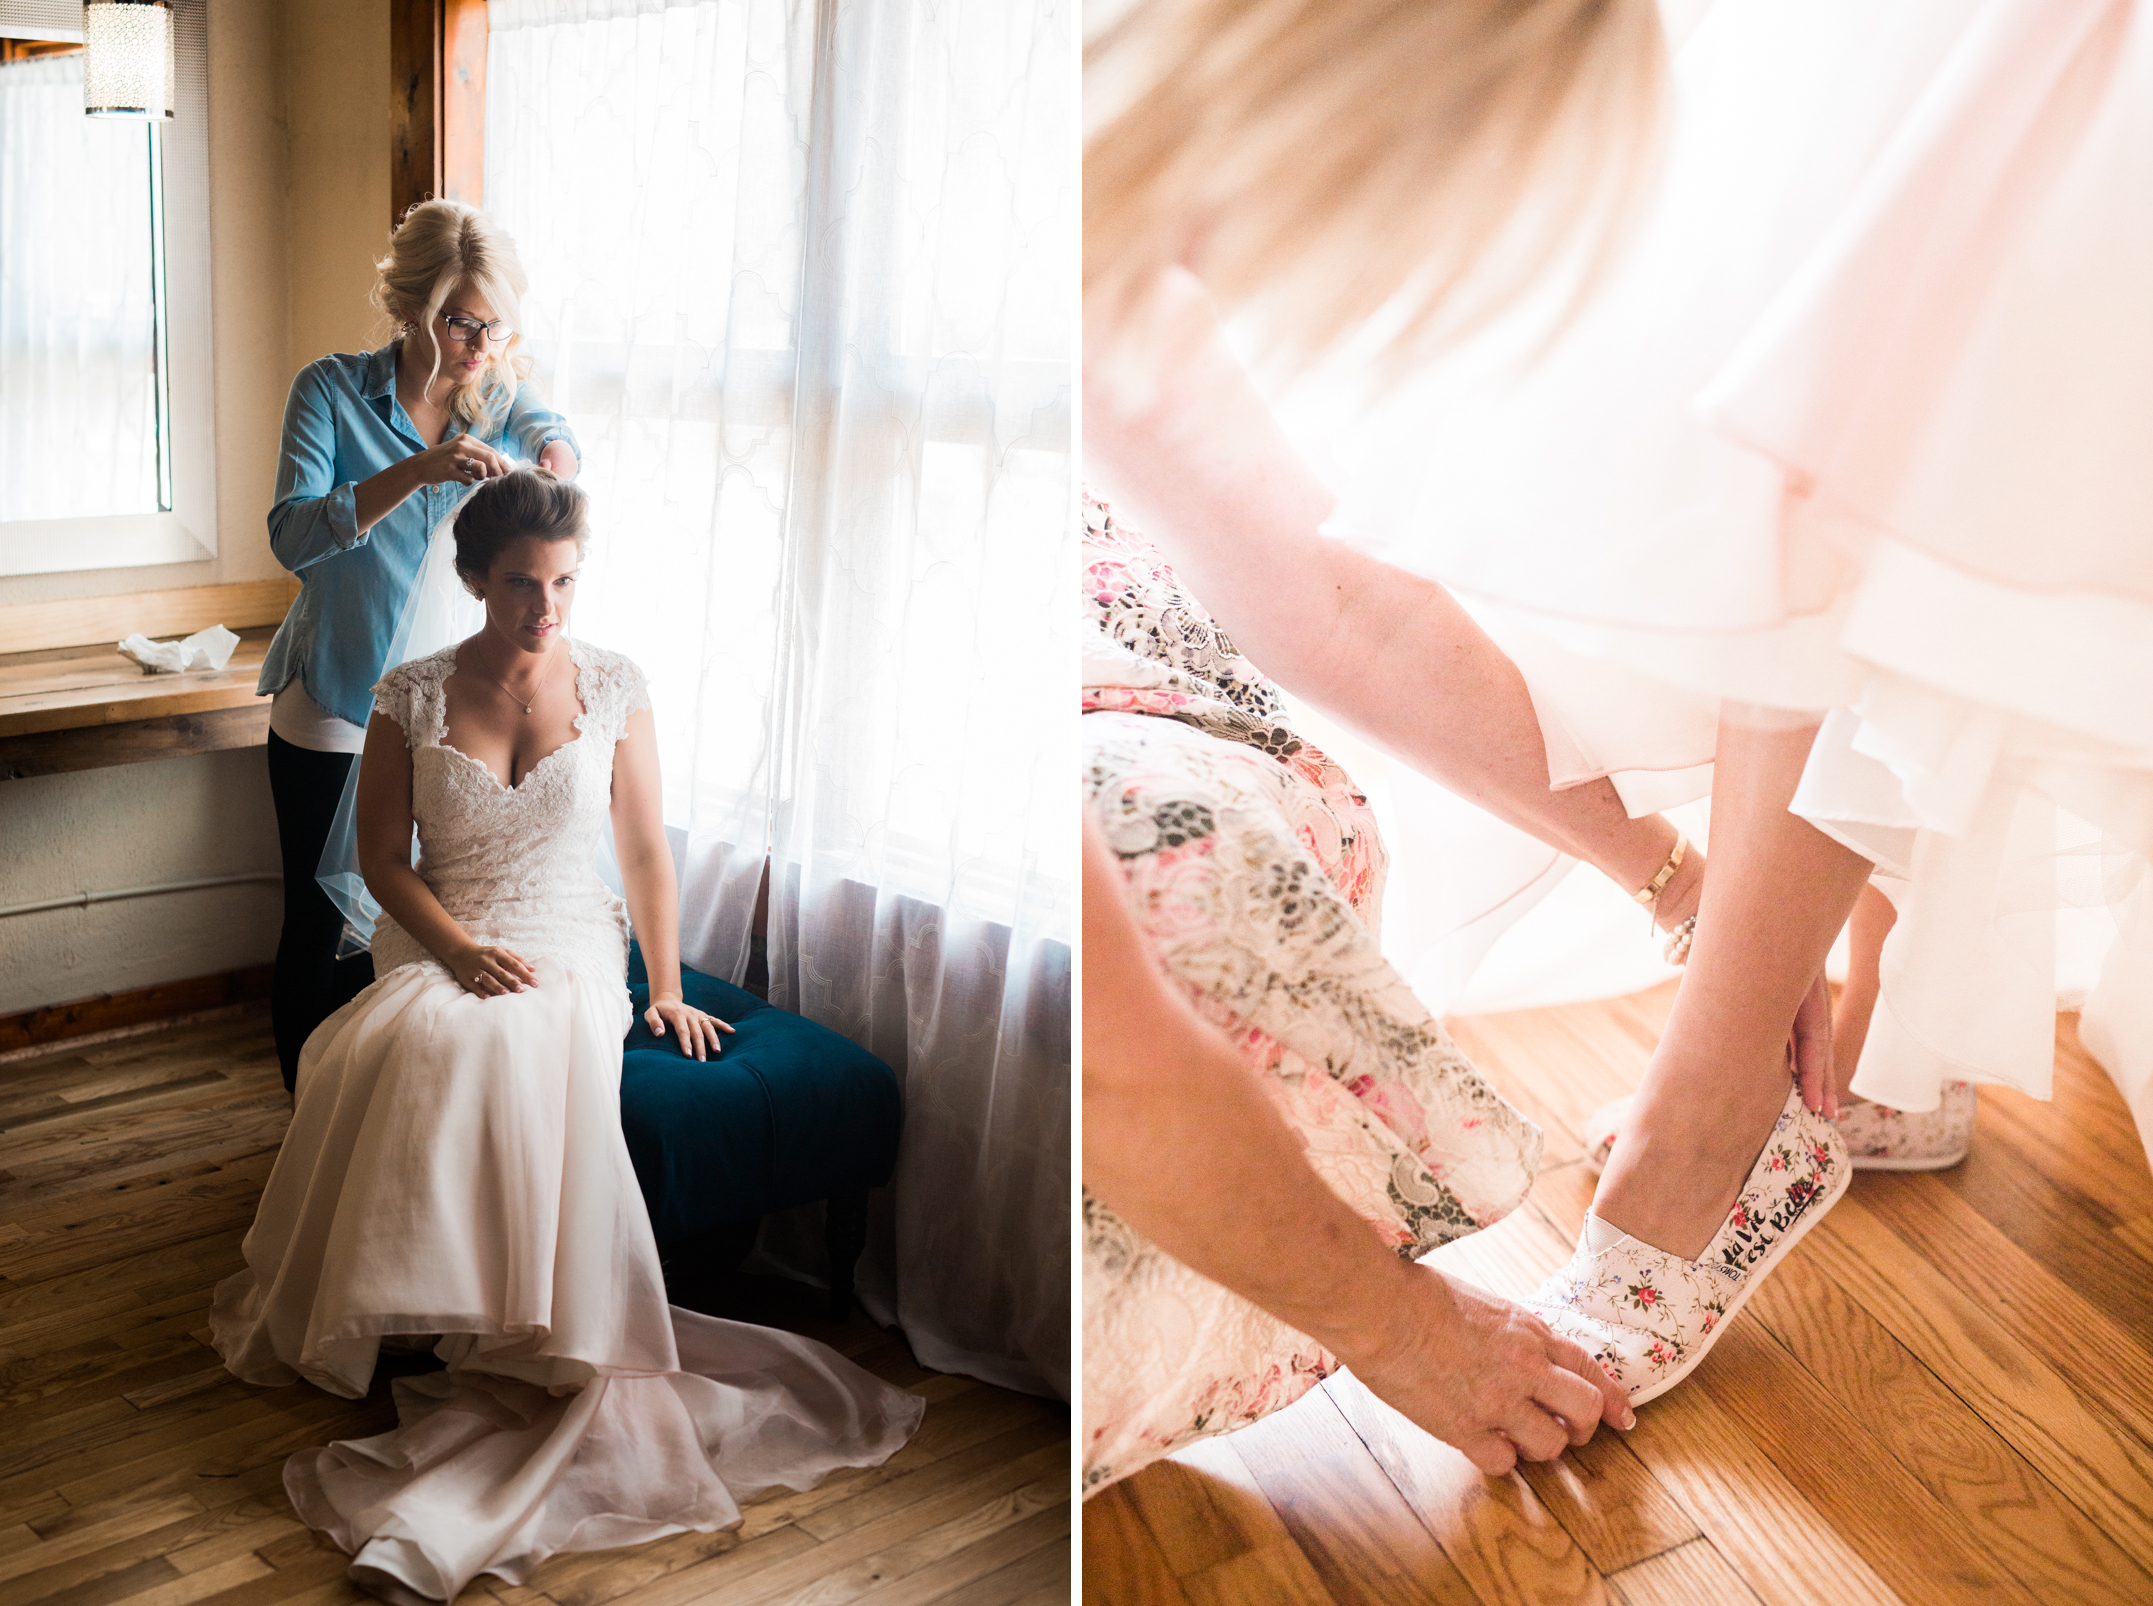 LegacyUnion-Wedding-Photographer-Glendale-CA-125 copy.jpg